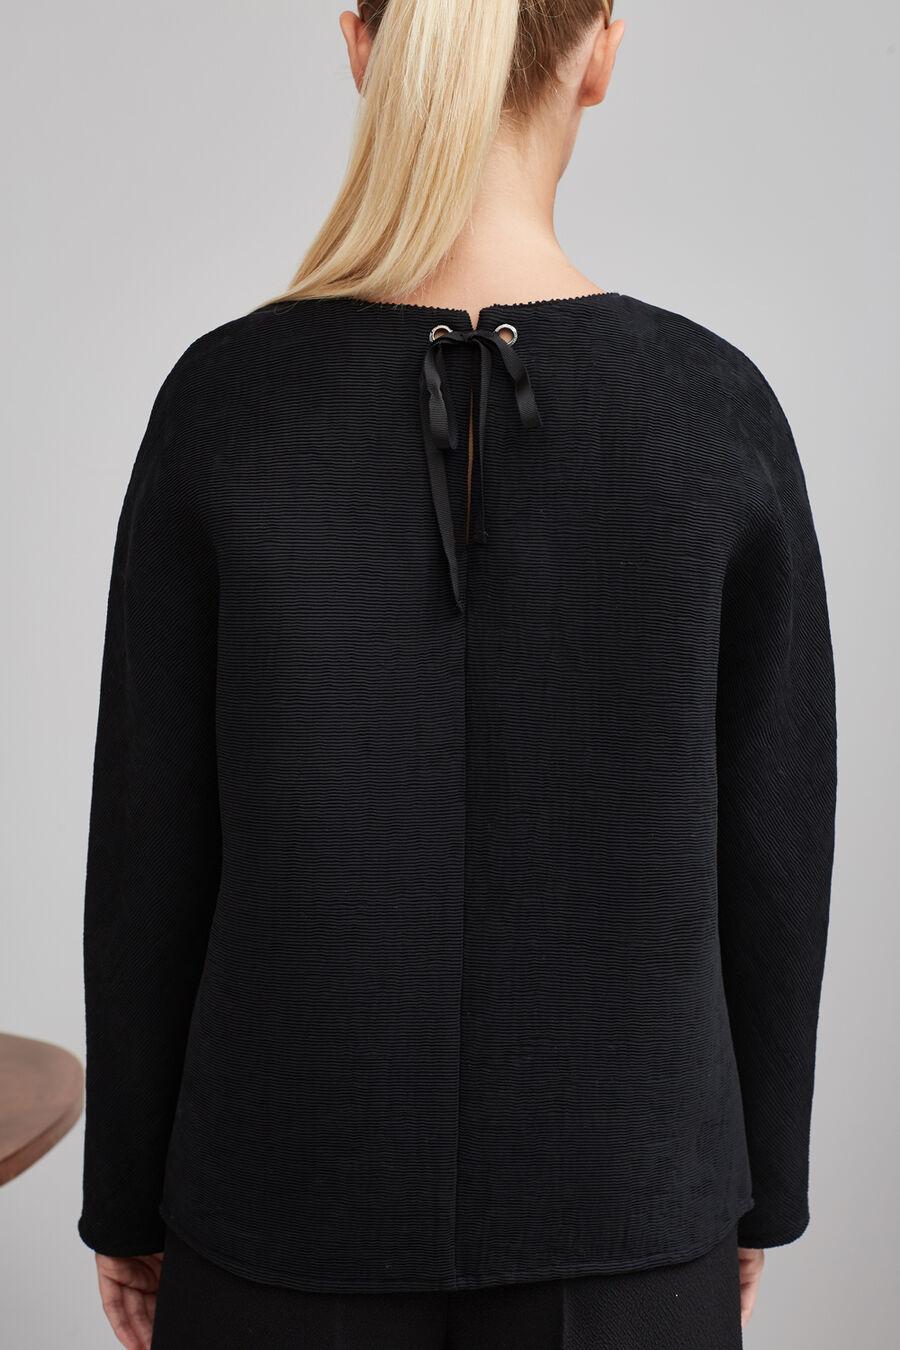 Black Ottoman top